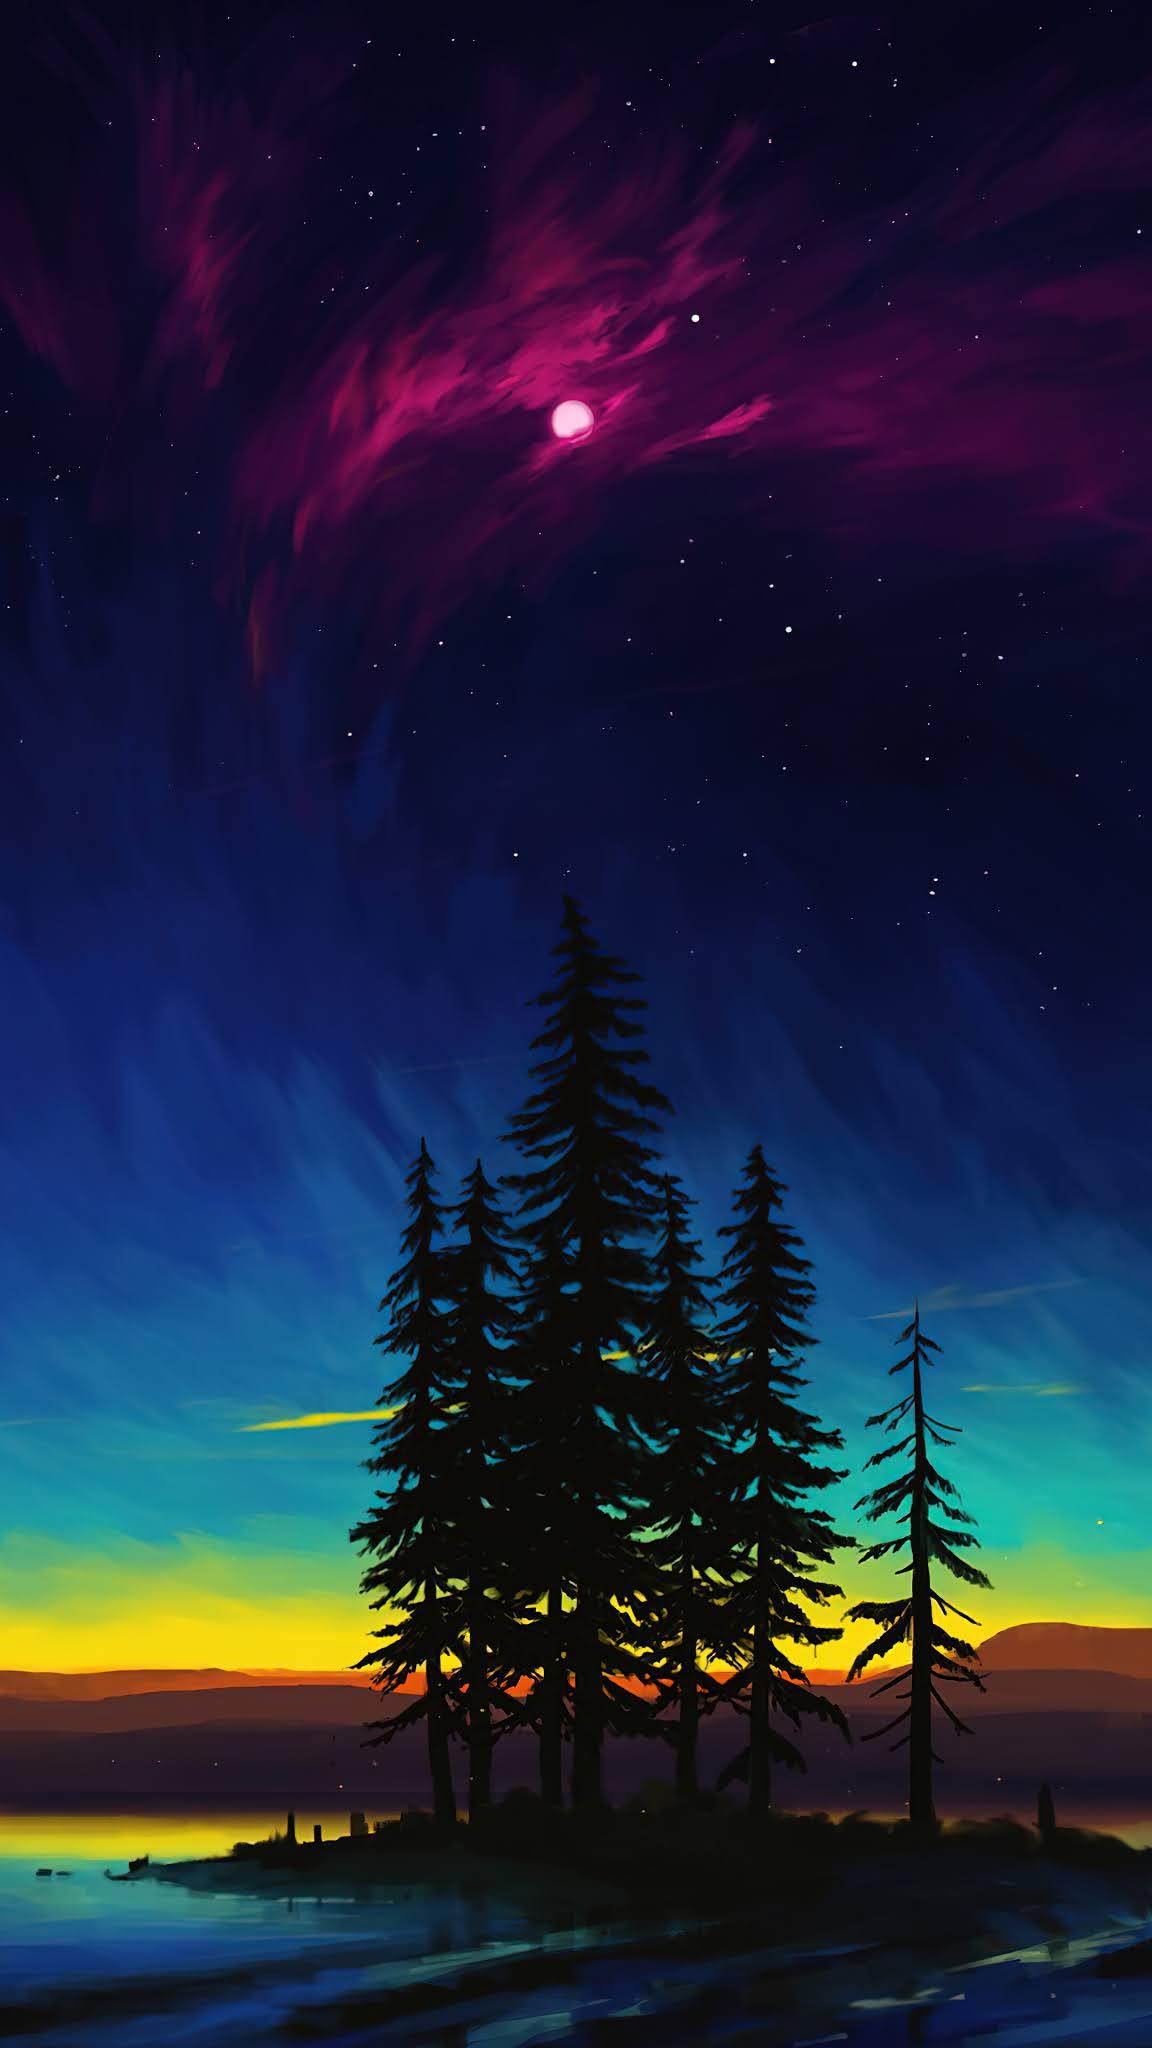 Sunset Moon Night Sky Landscape Scenery Digital Art Mobile wallpaper